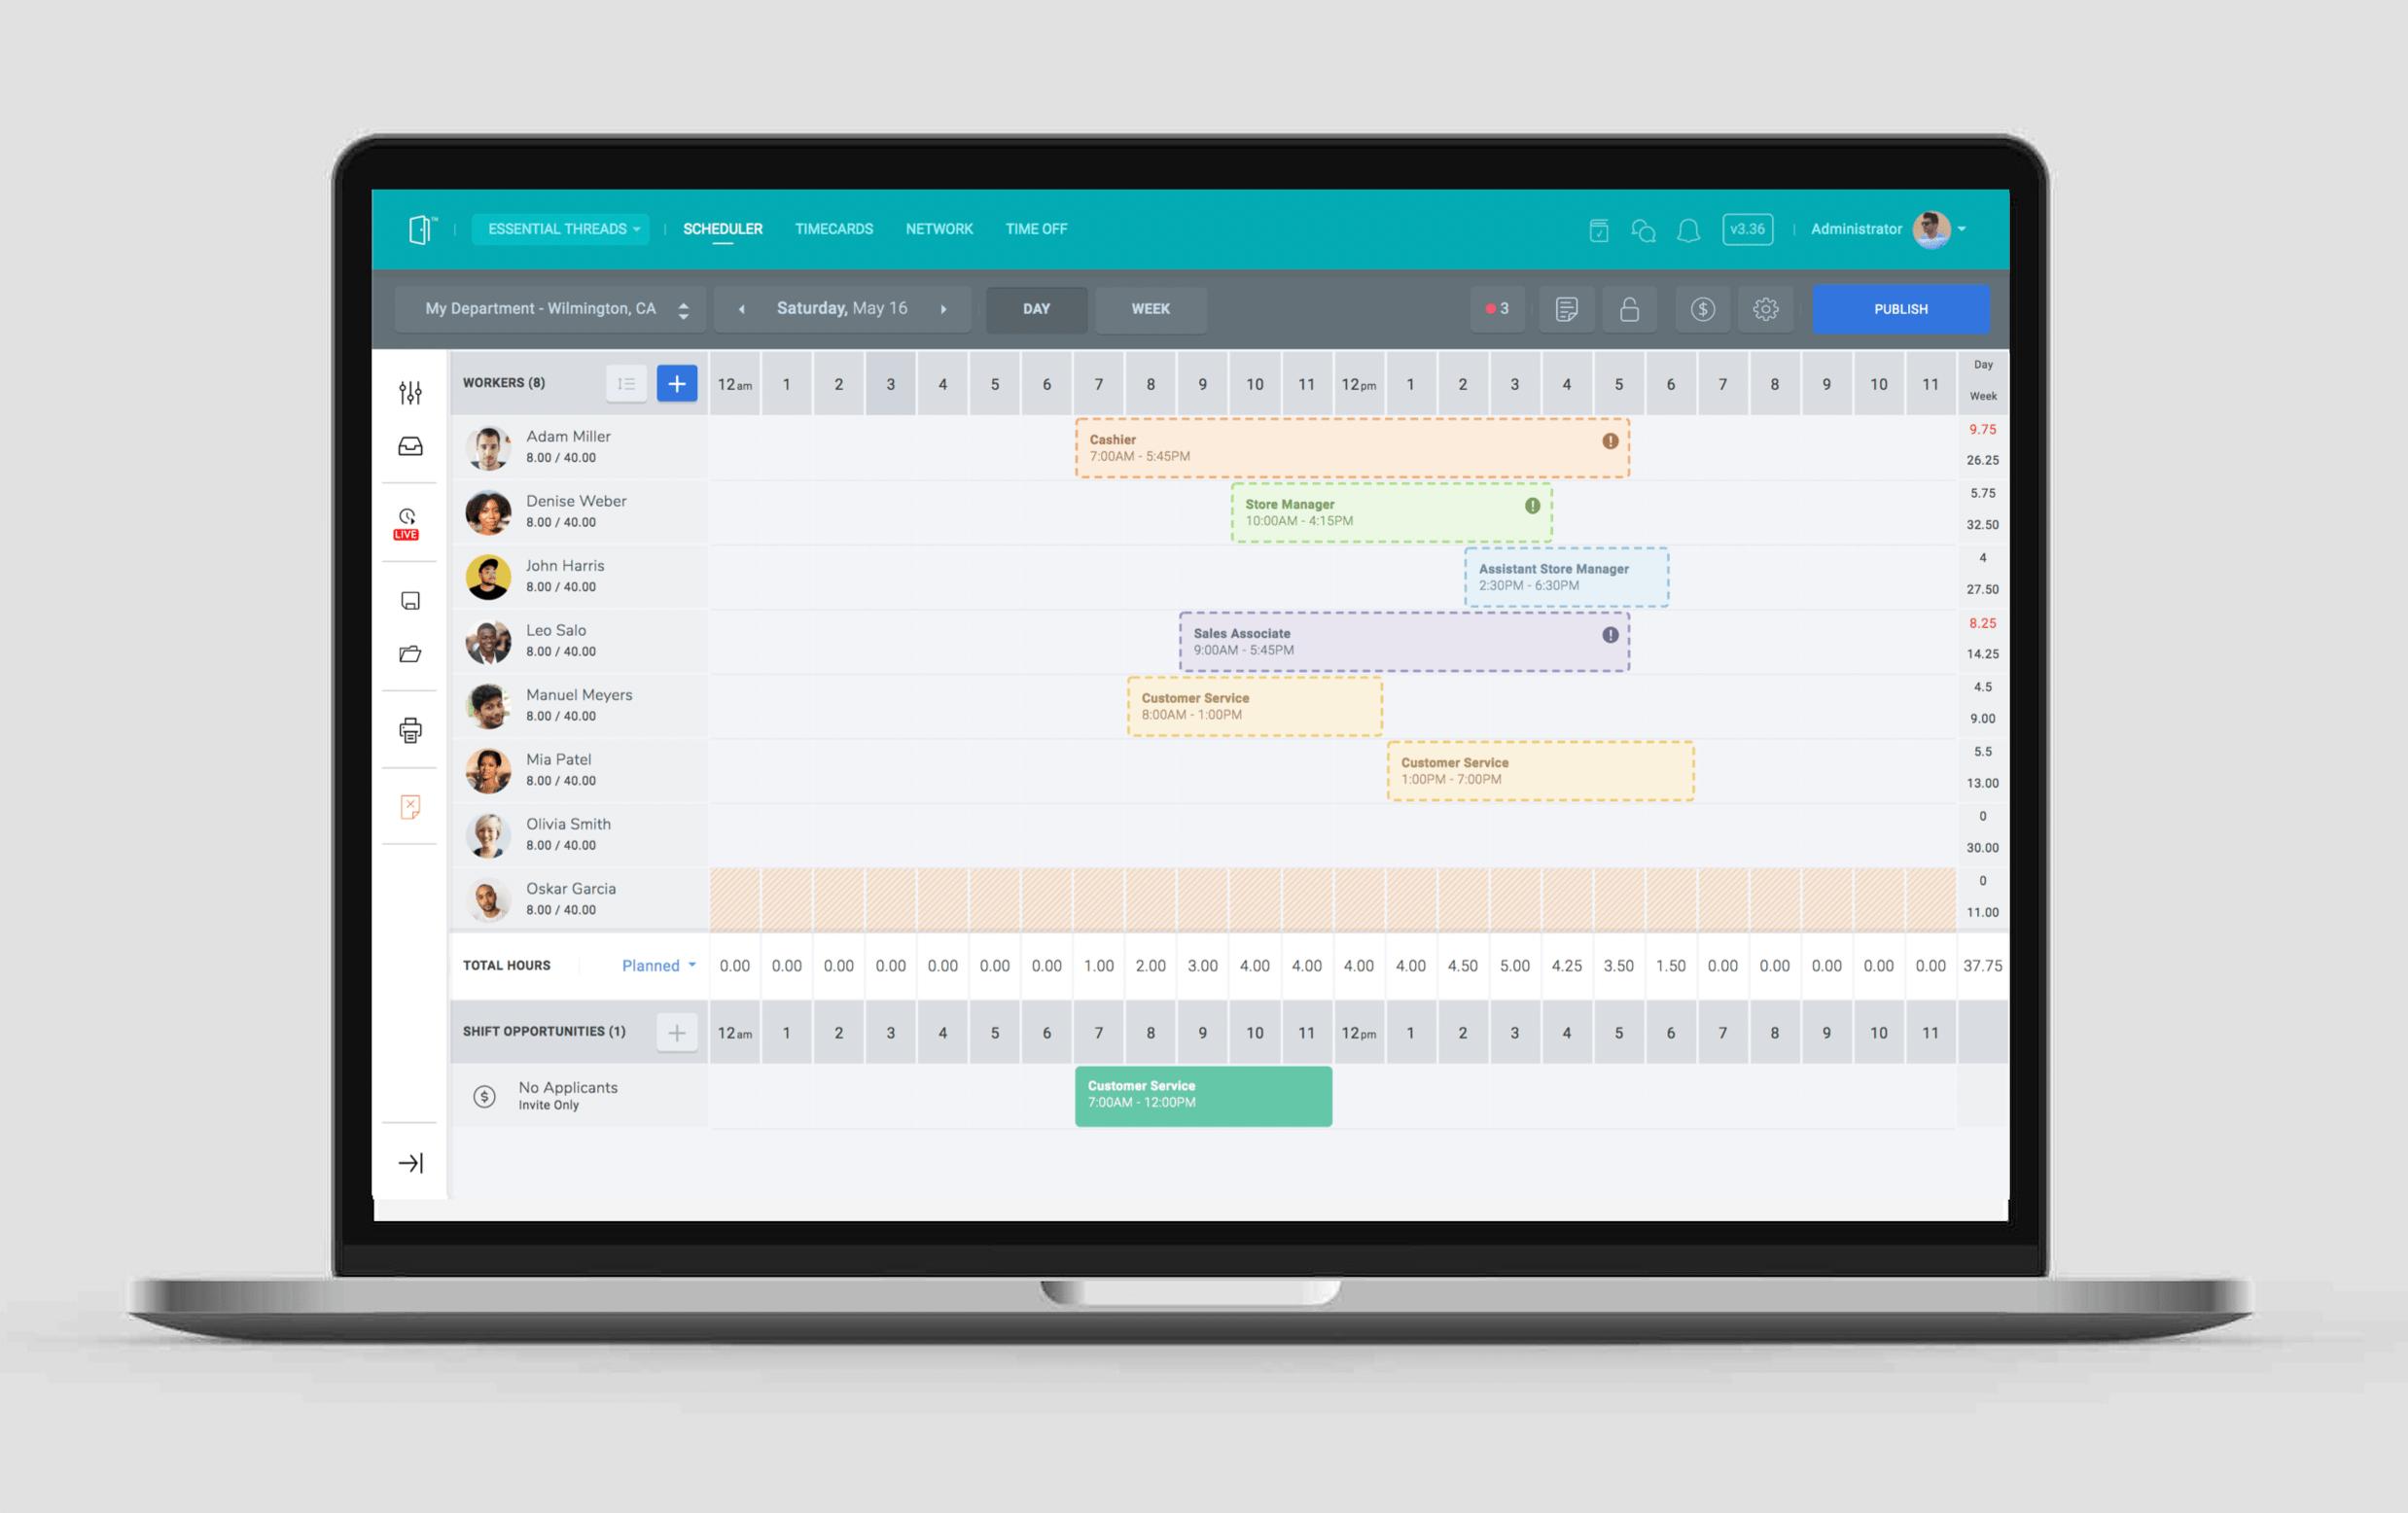 SocialSchedules Software - Manager's Daily Scheduler